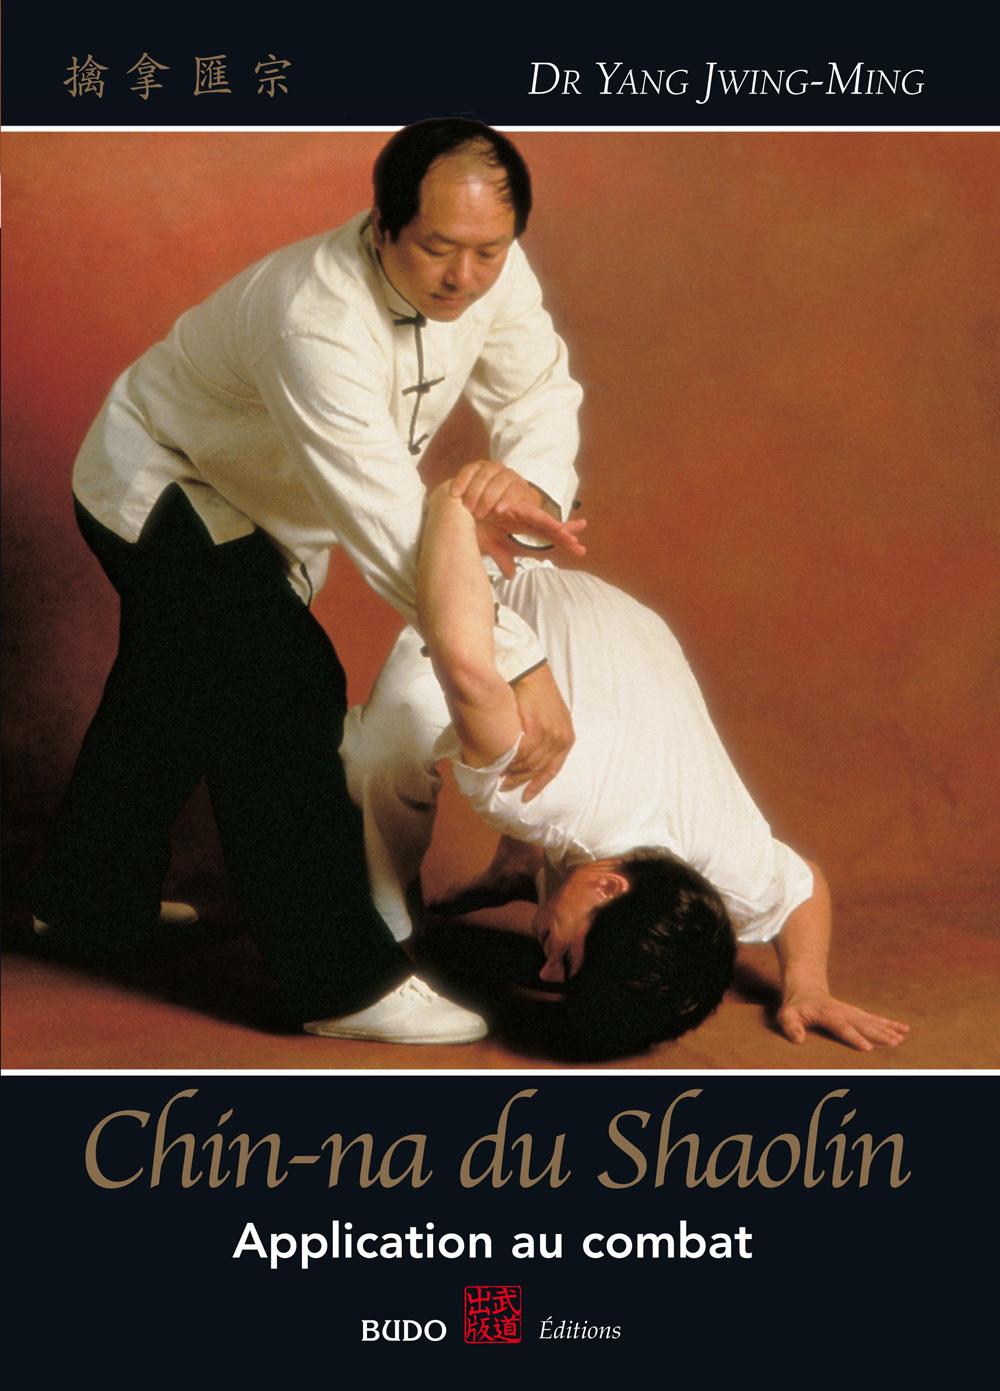 CHIN-NA DU SHAOLIN : APPLICATION AU COMBAT